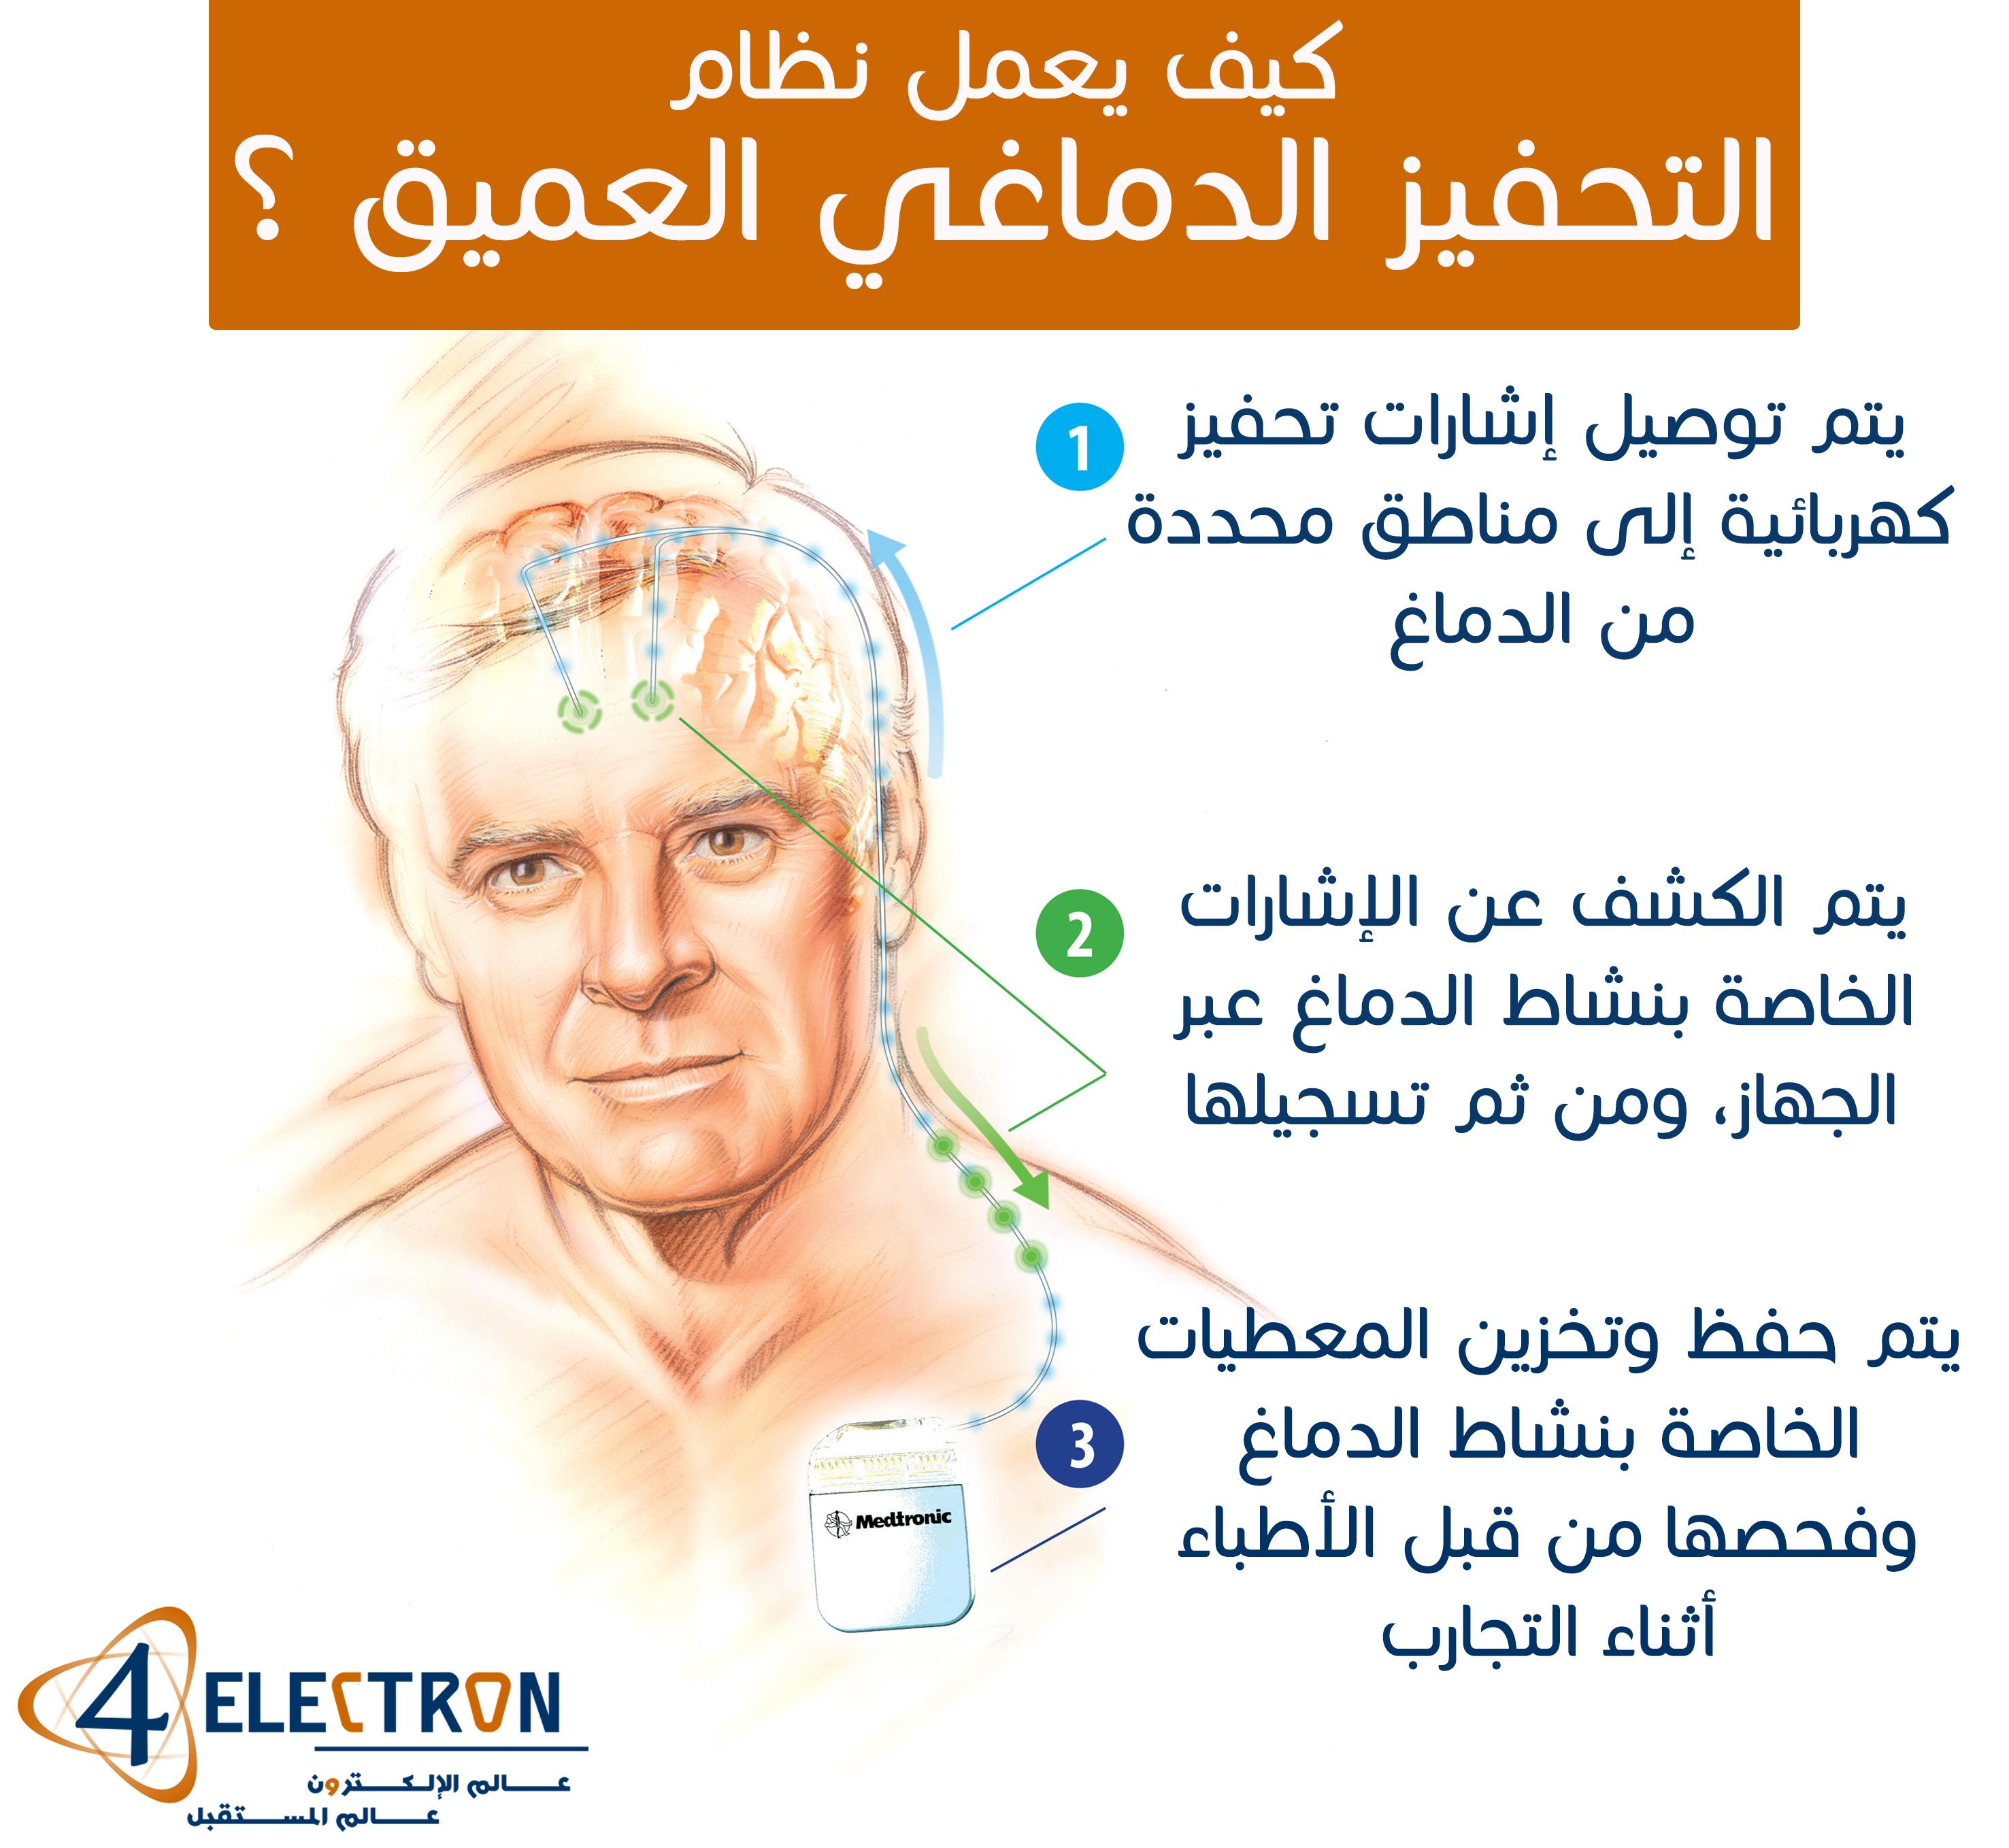 deep-brain-stimulator-4electron